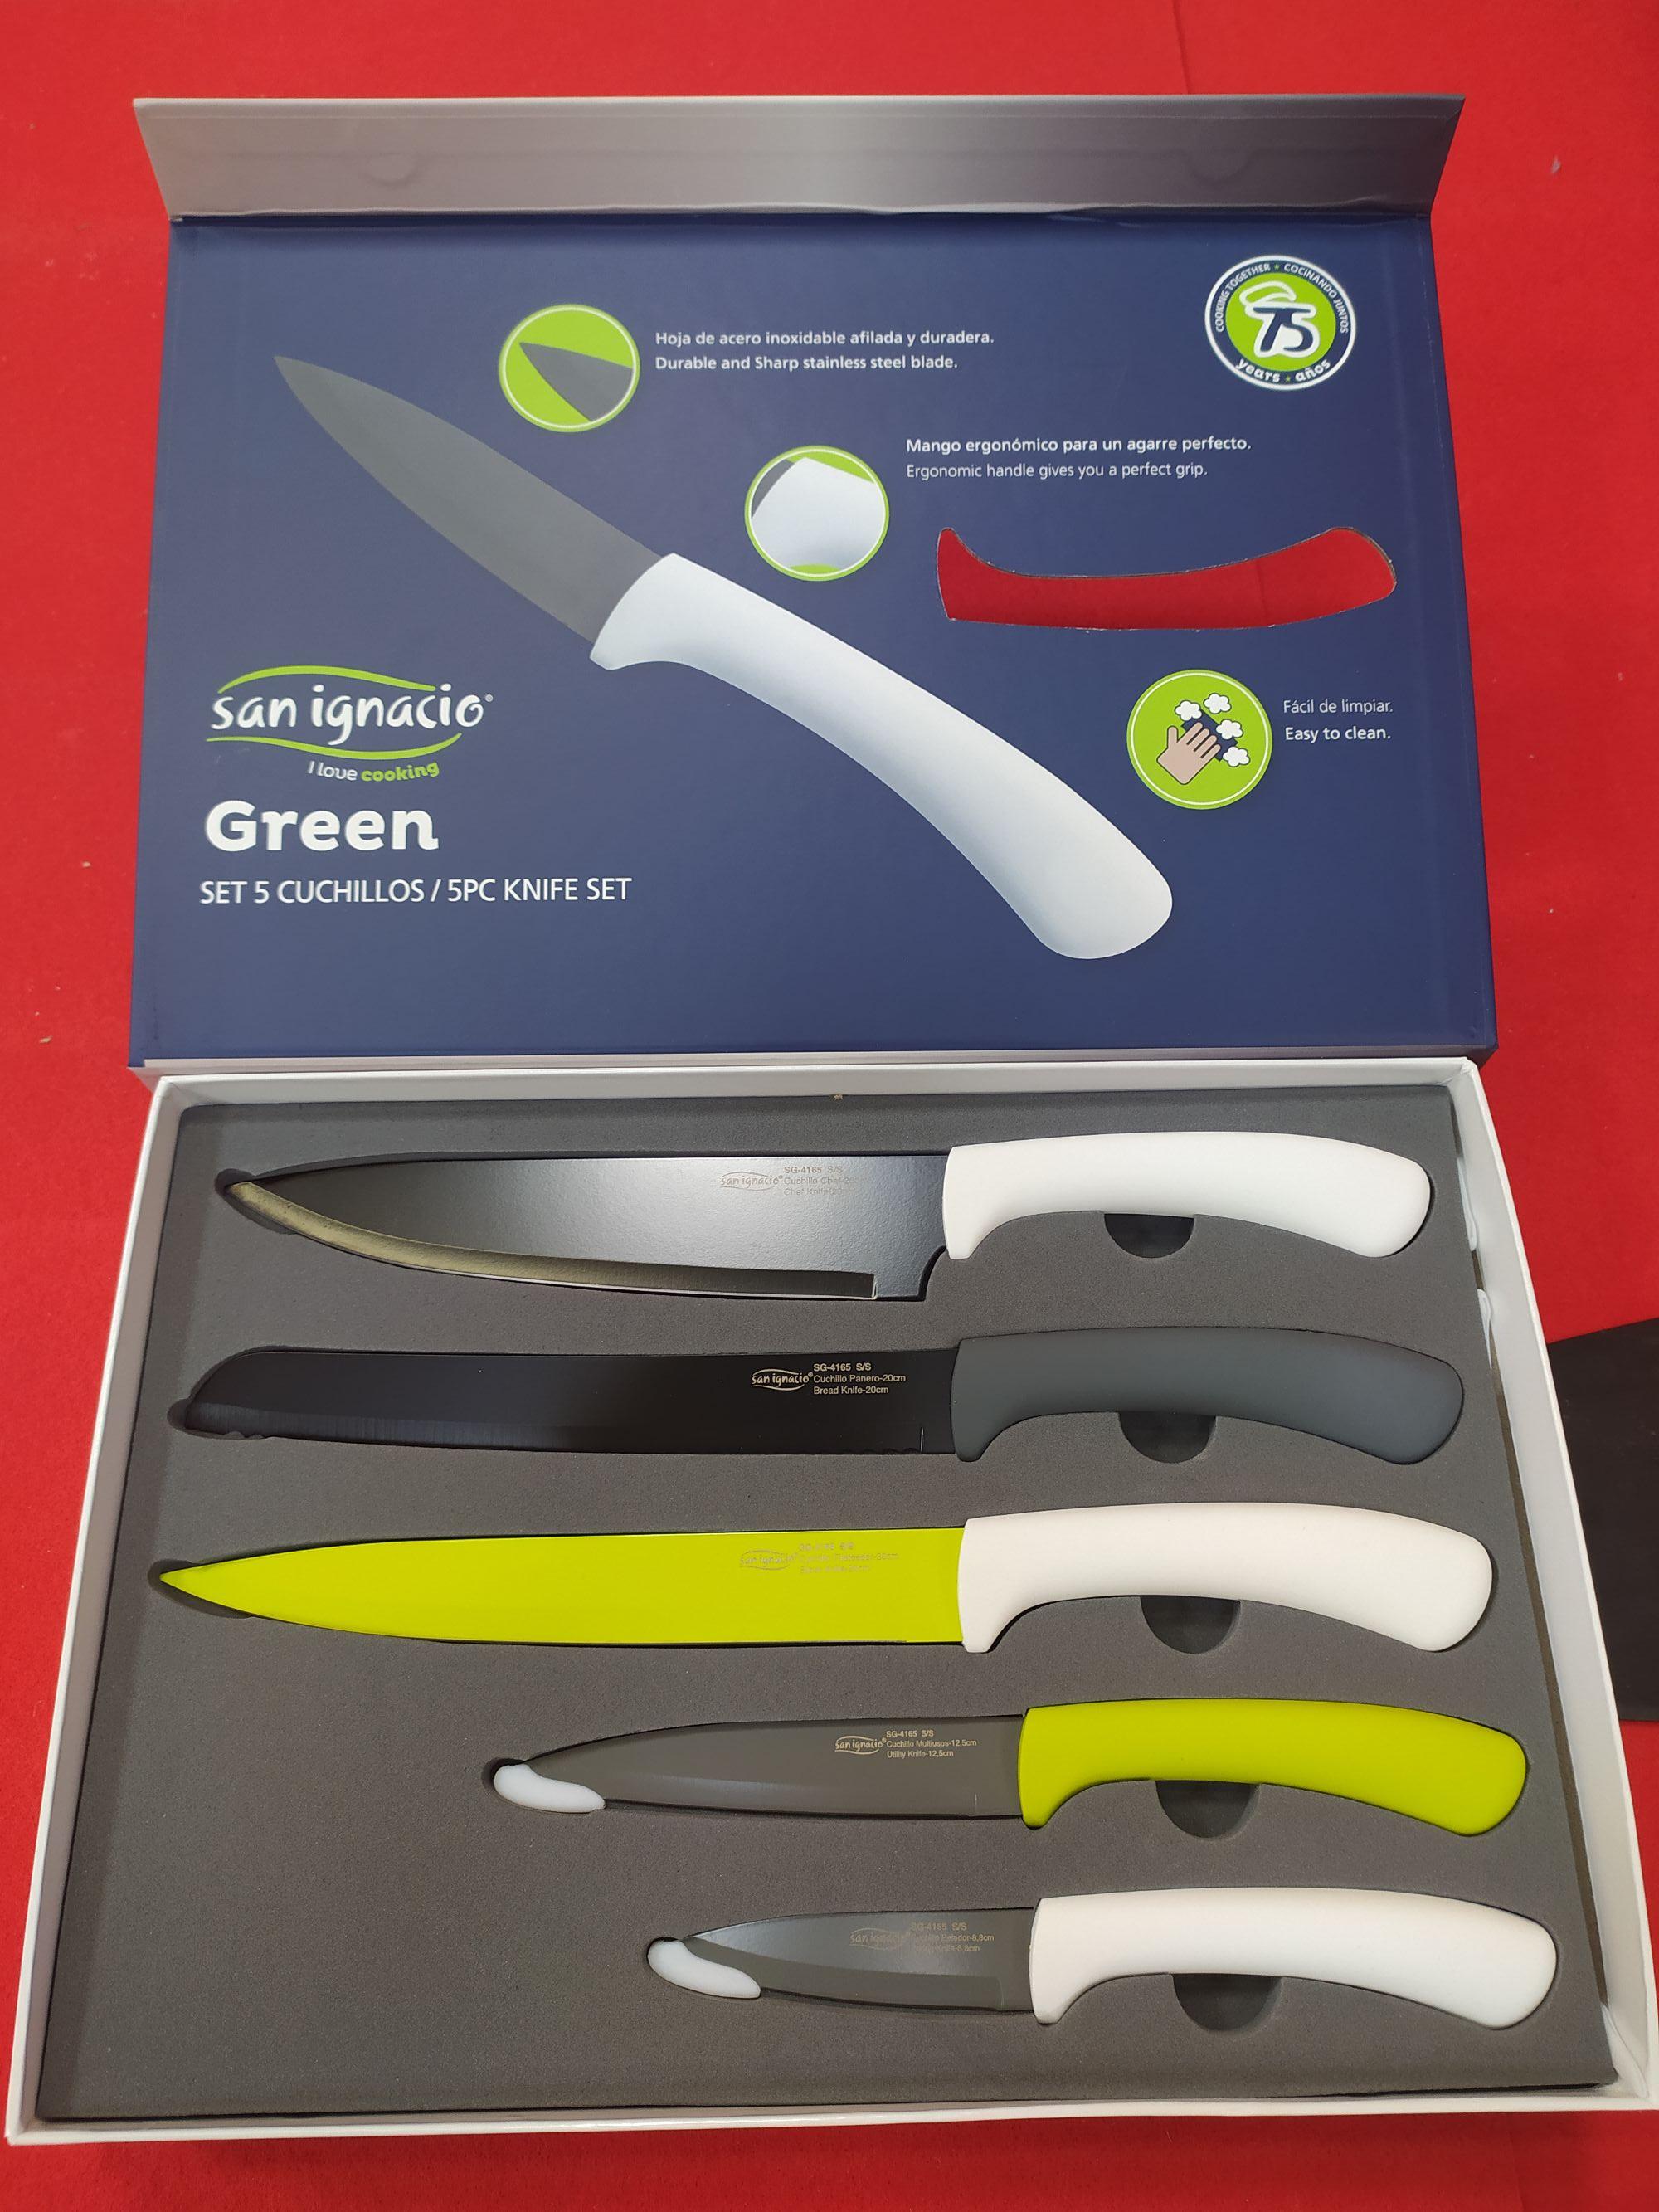 Set 5 cuchillos acero inoxidable